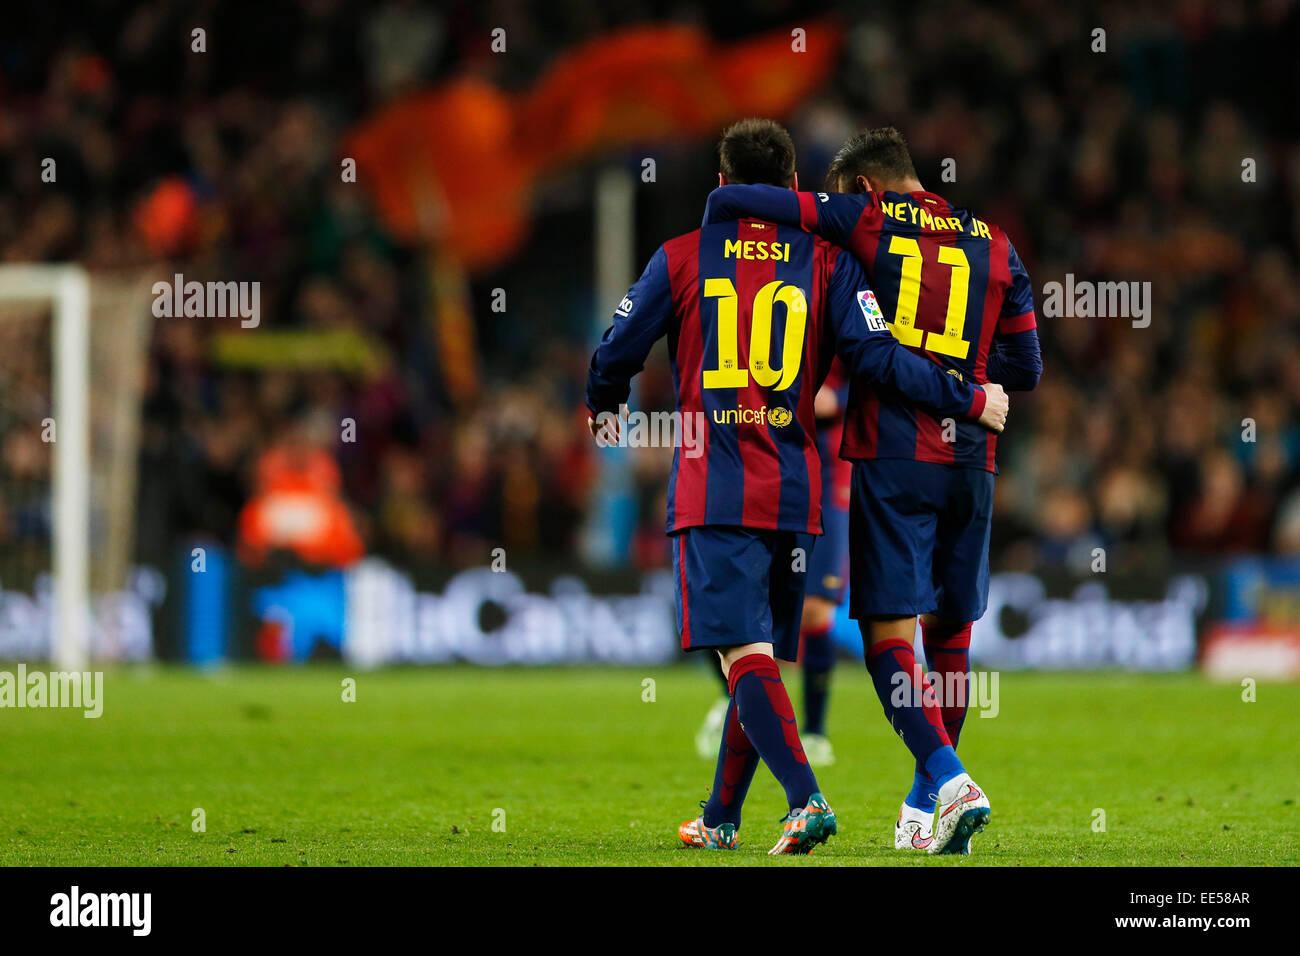 Messi Neymar Stock Photos Messi Neymar Stock Images Alamy